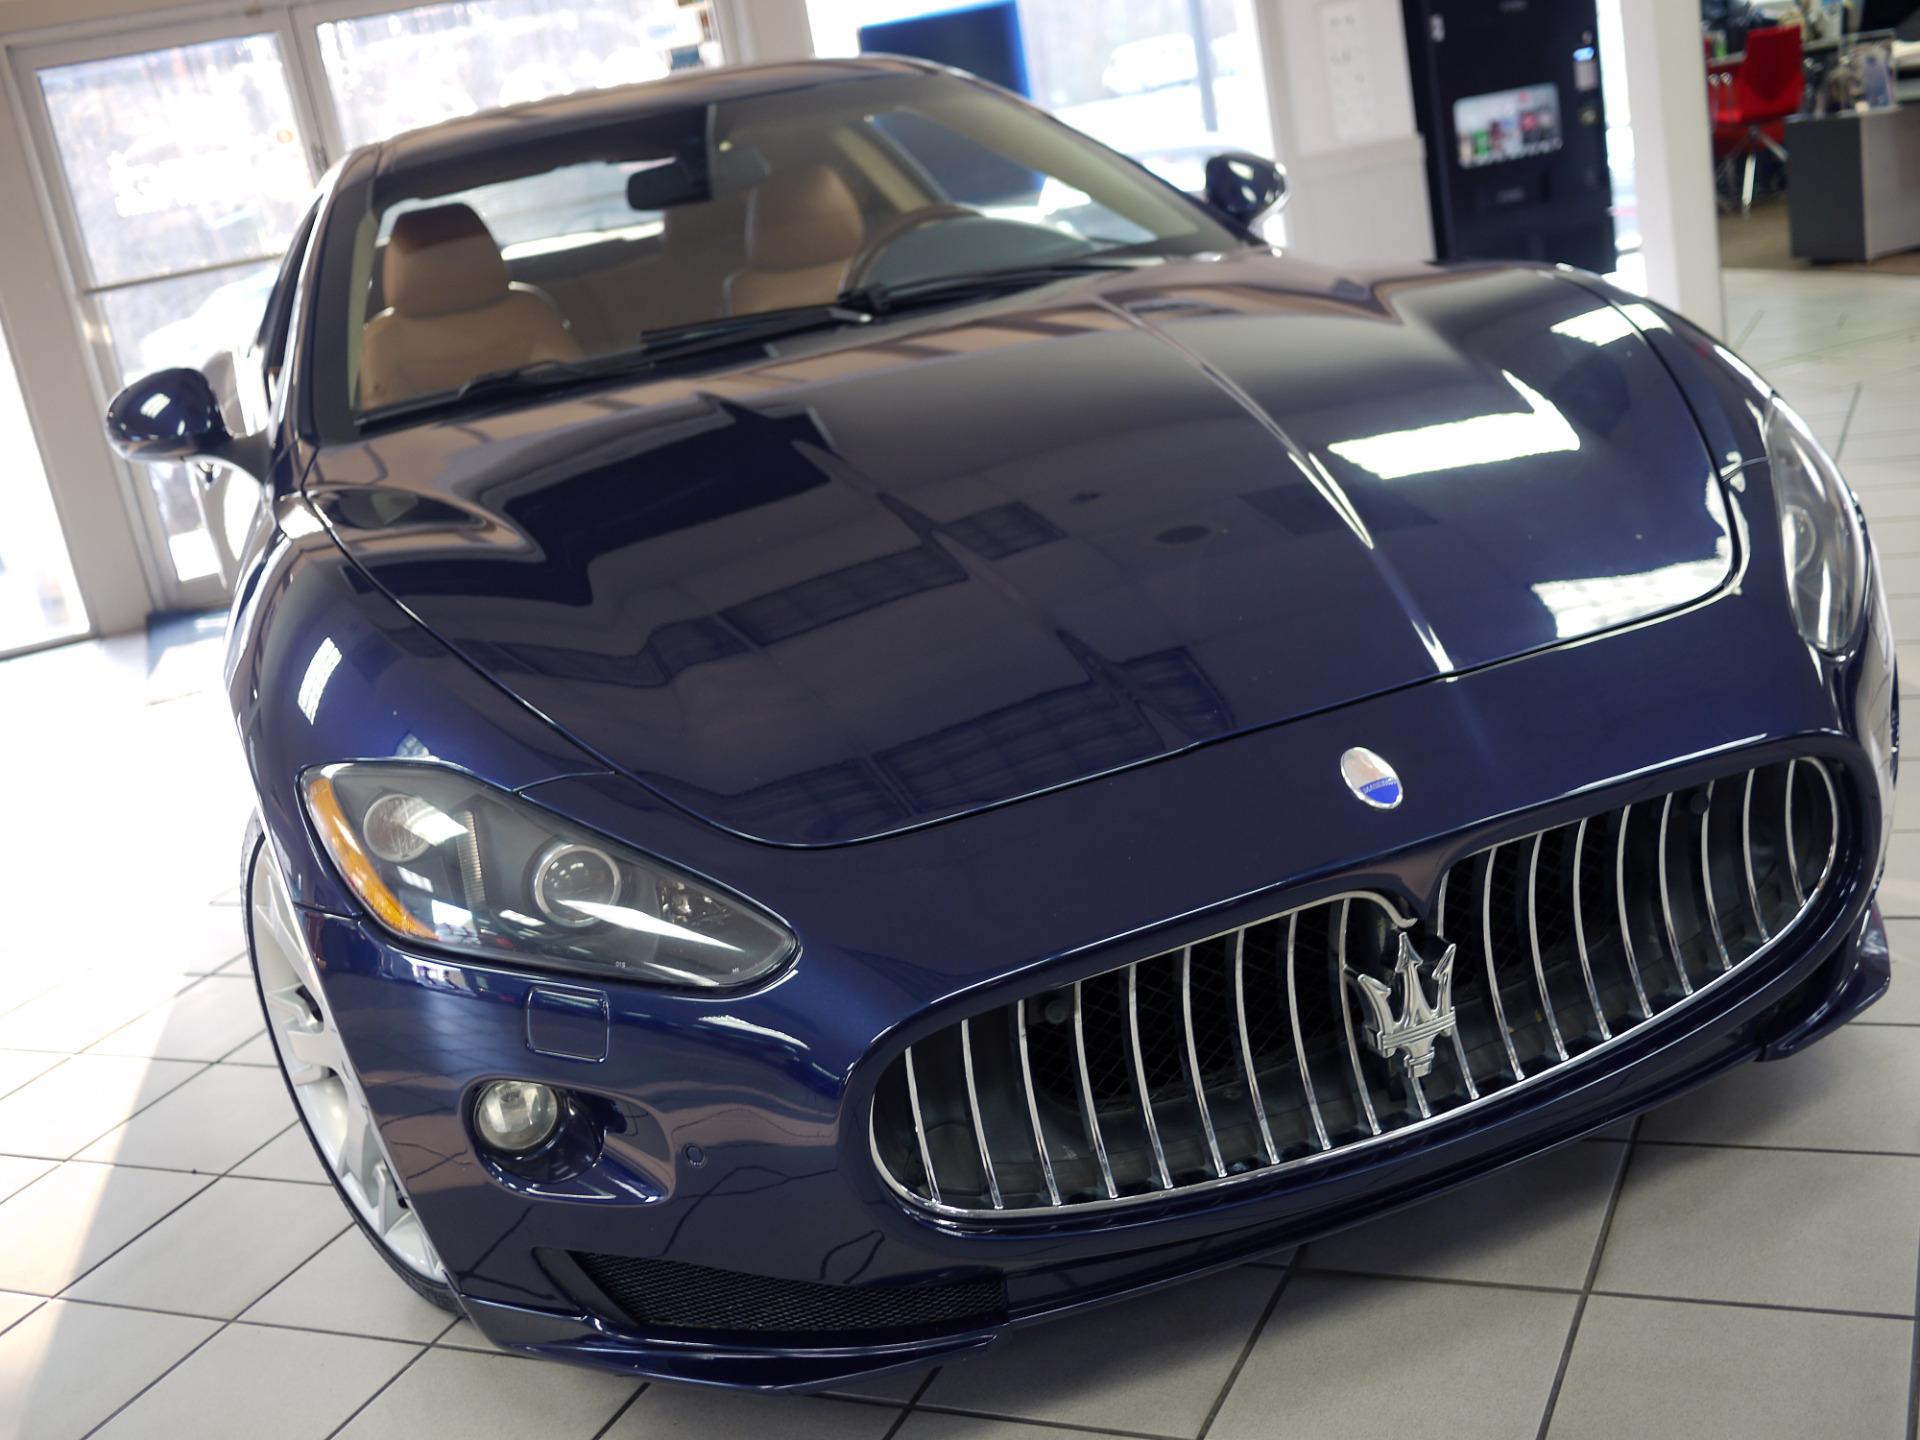 Maserati Granturismo S Maserati Granturismo 2016 Image 92